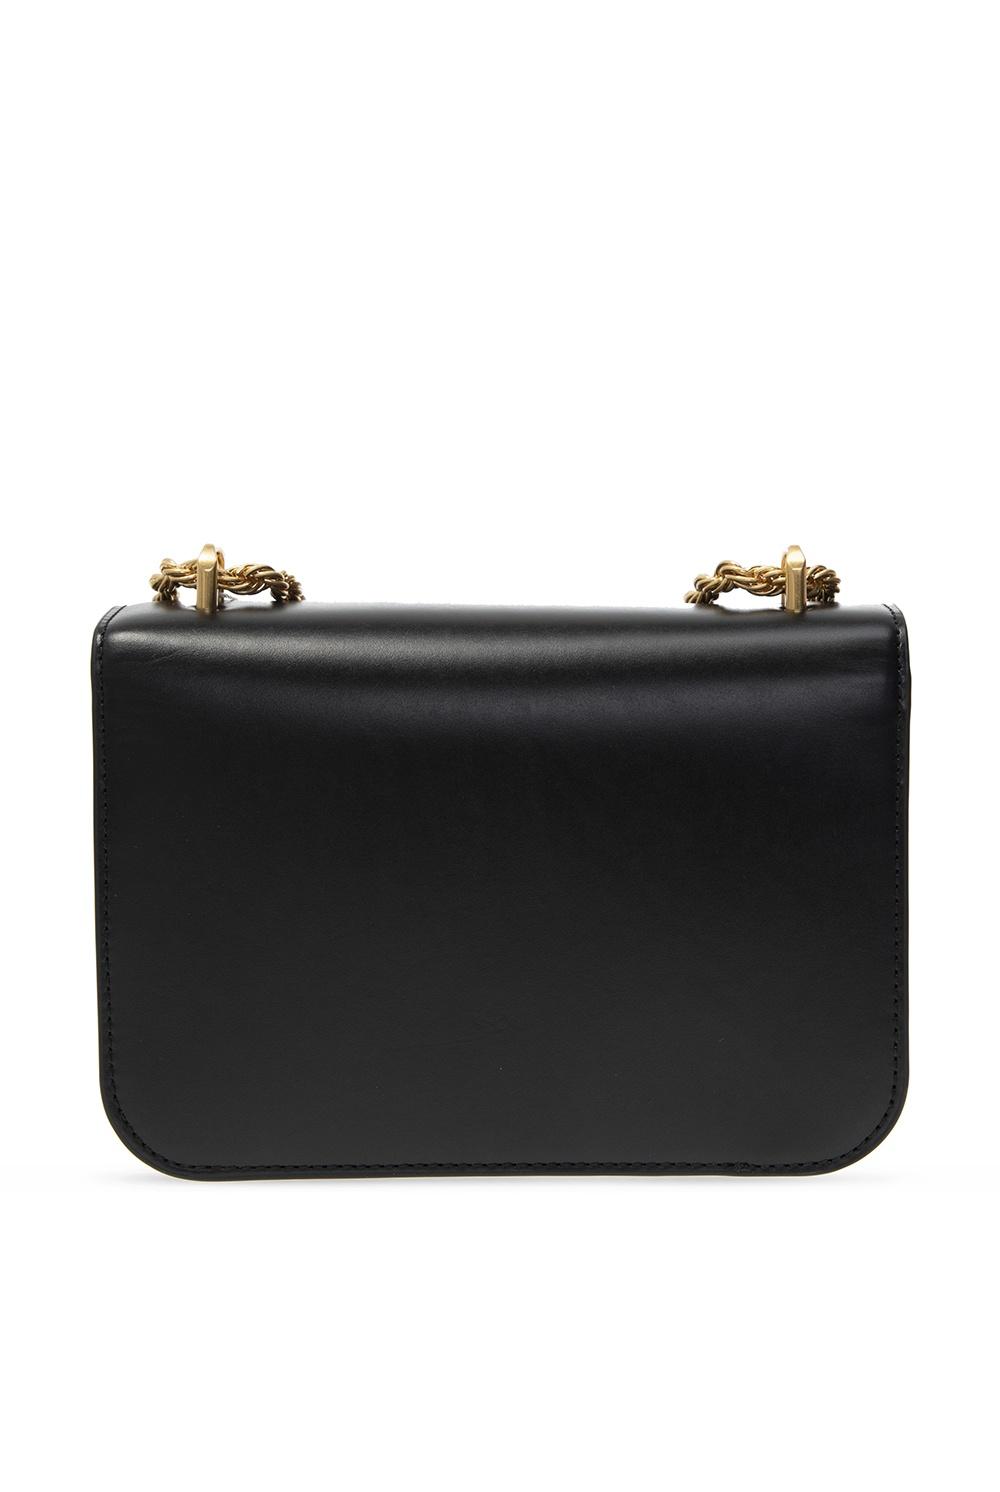 Tory Burch 'Eleanor' leather shoulder bag